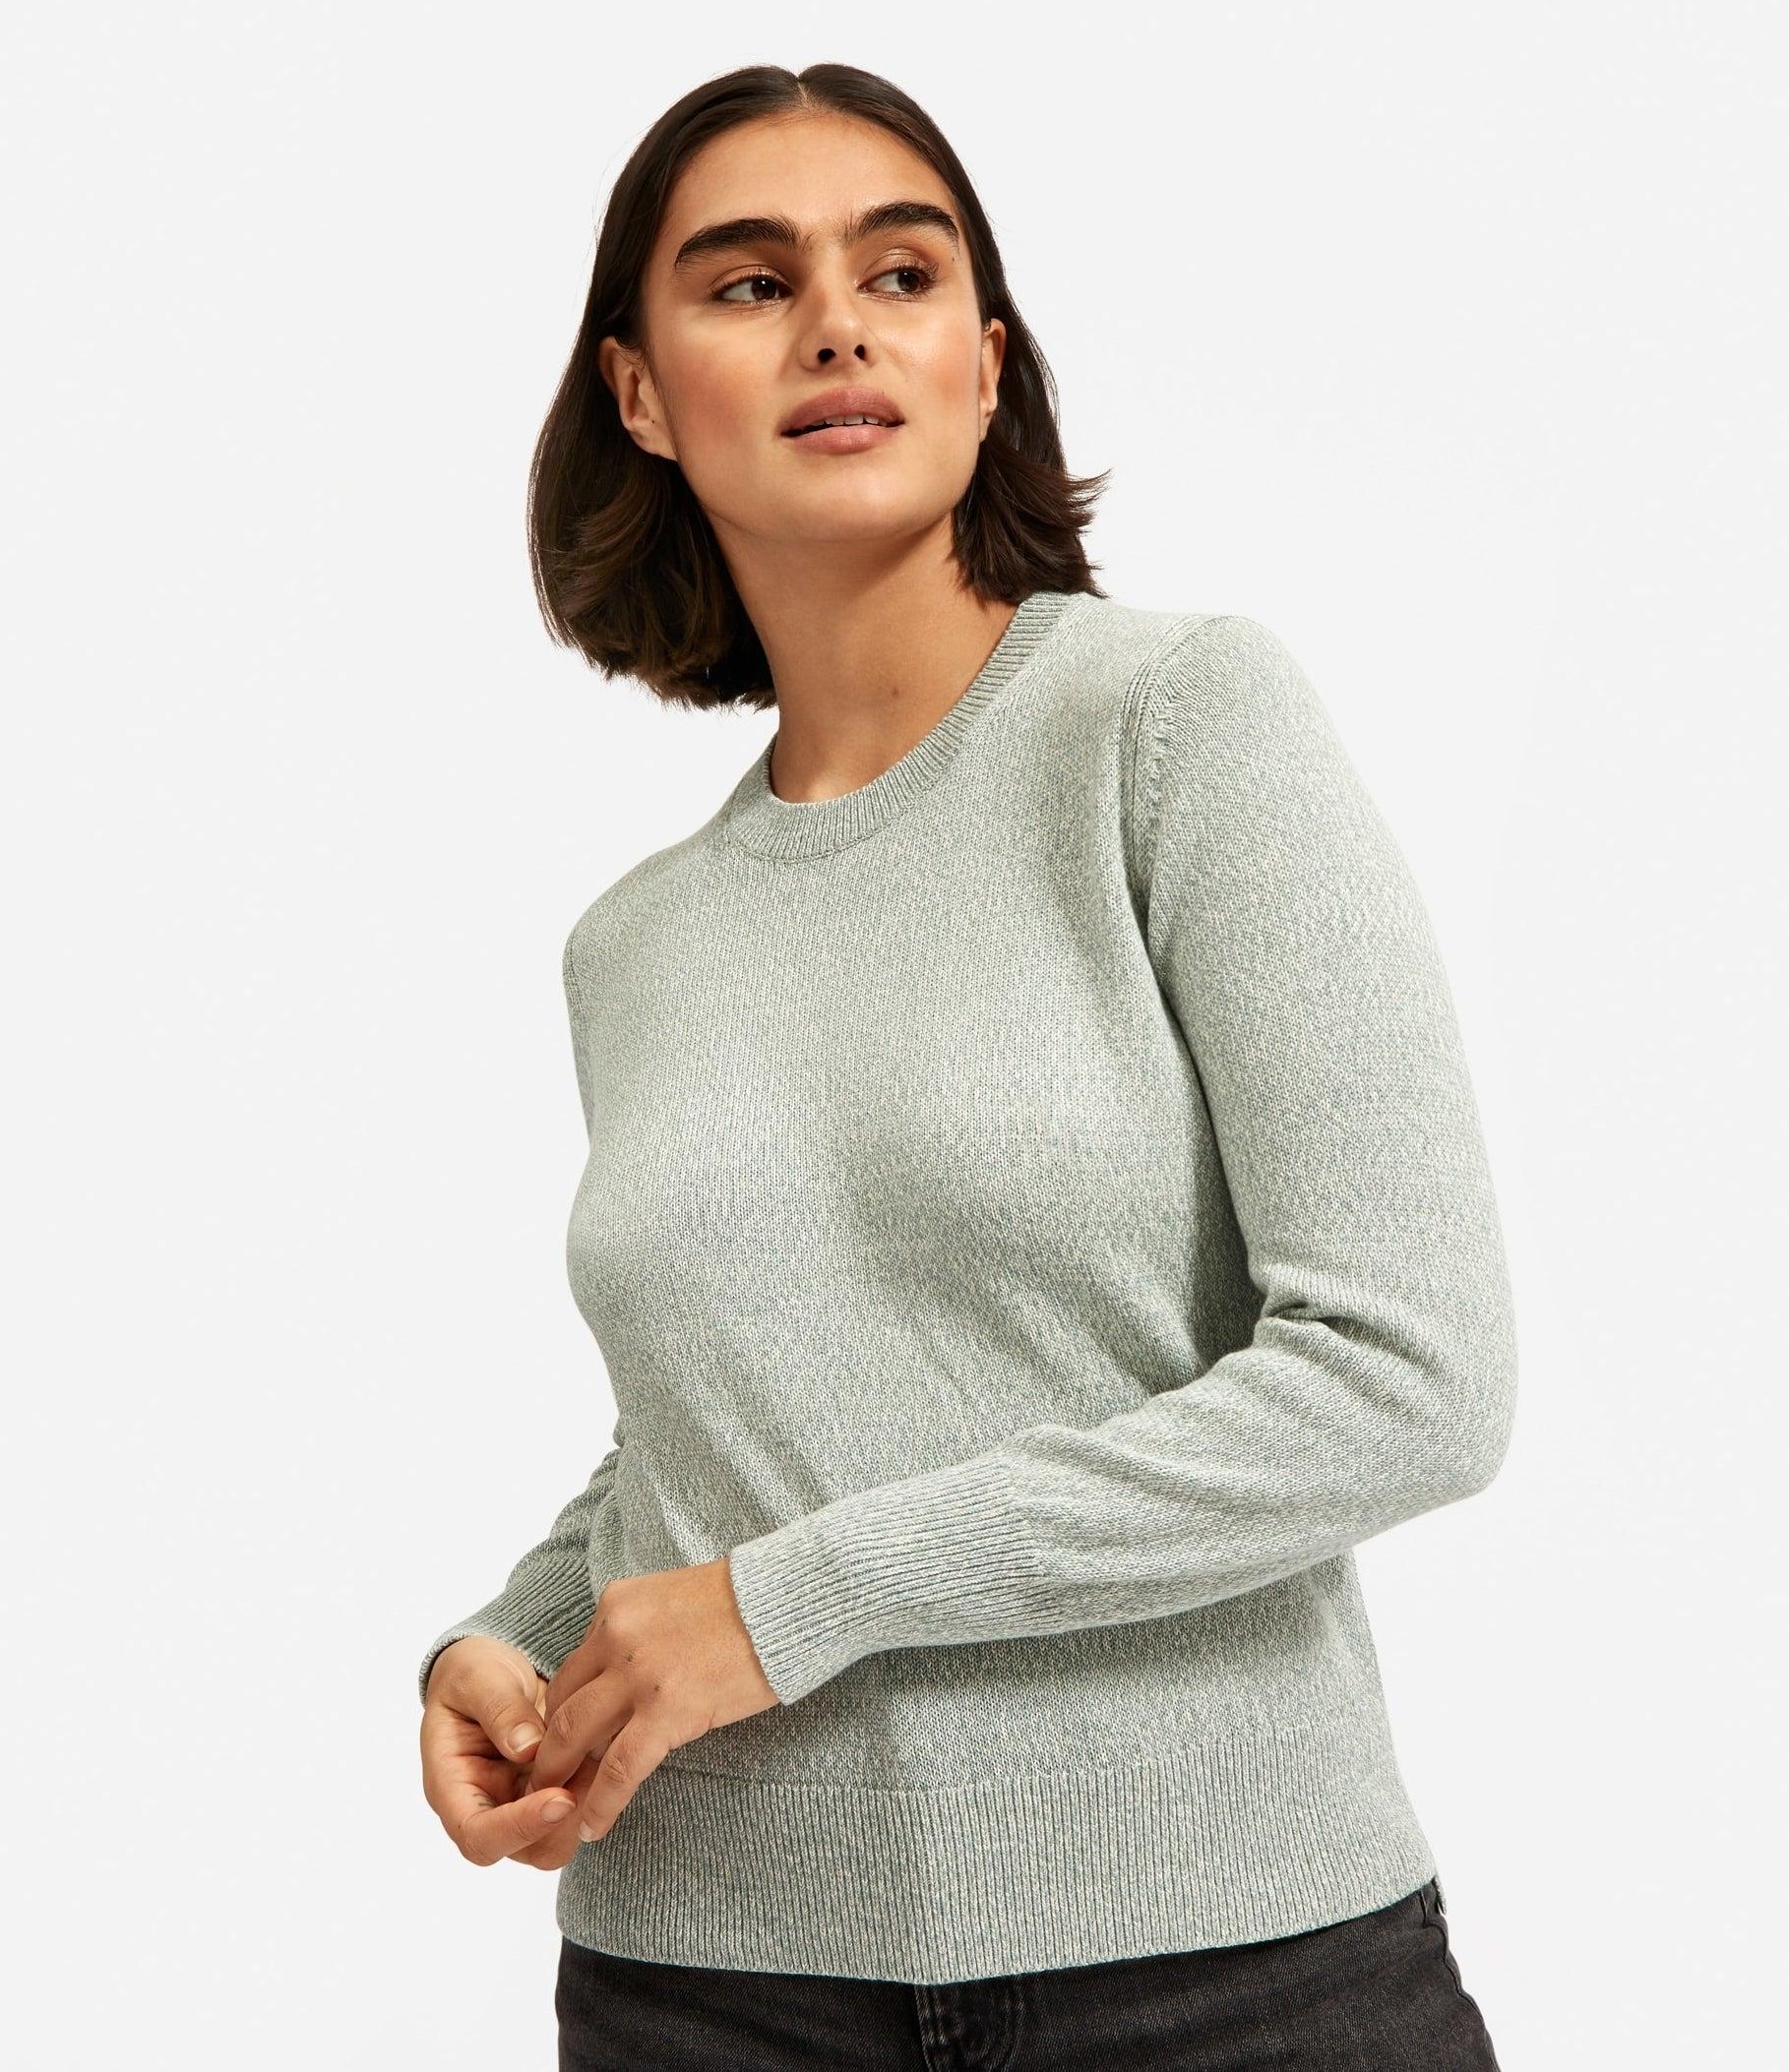 model in light green crew sweater